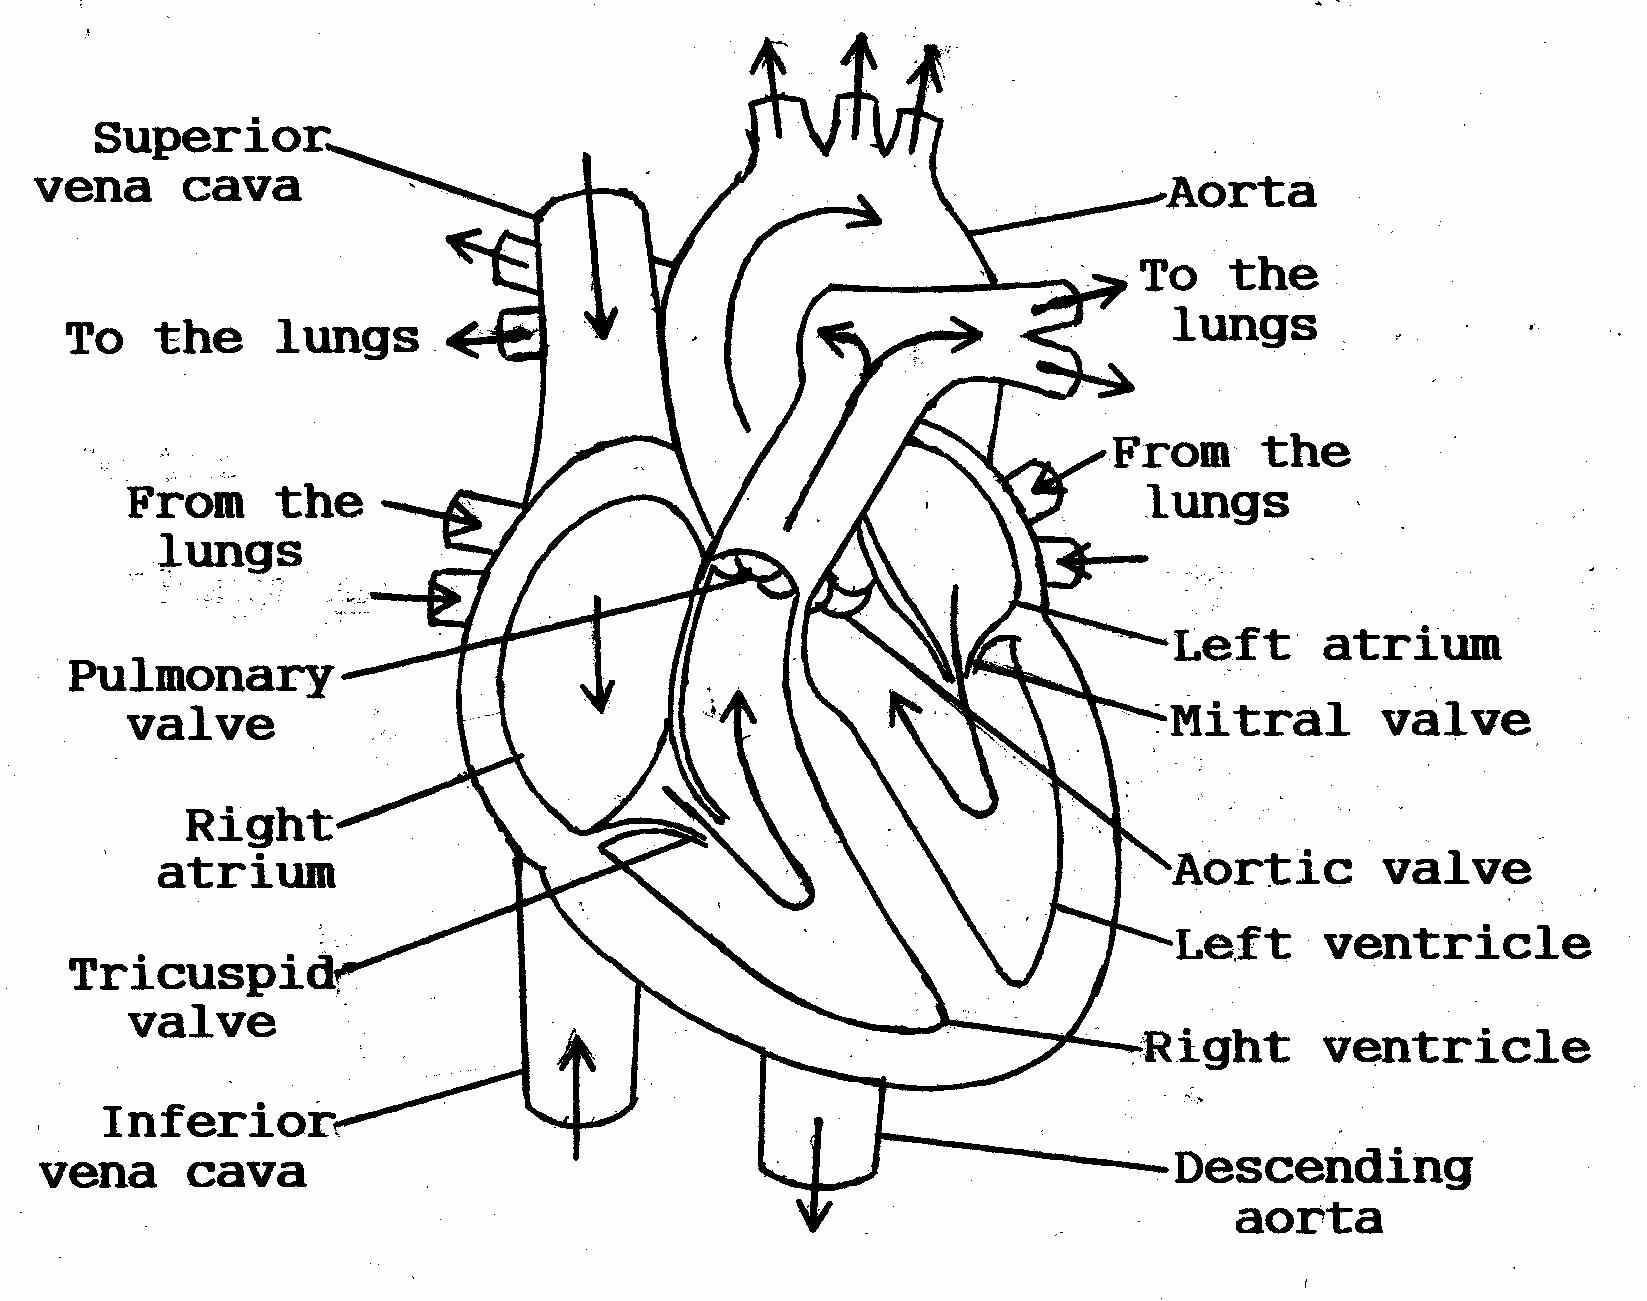 Heart Diagram Worksheet Blank Fresh 11 Best Of Blank Heart Diagram Worksheet with Word